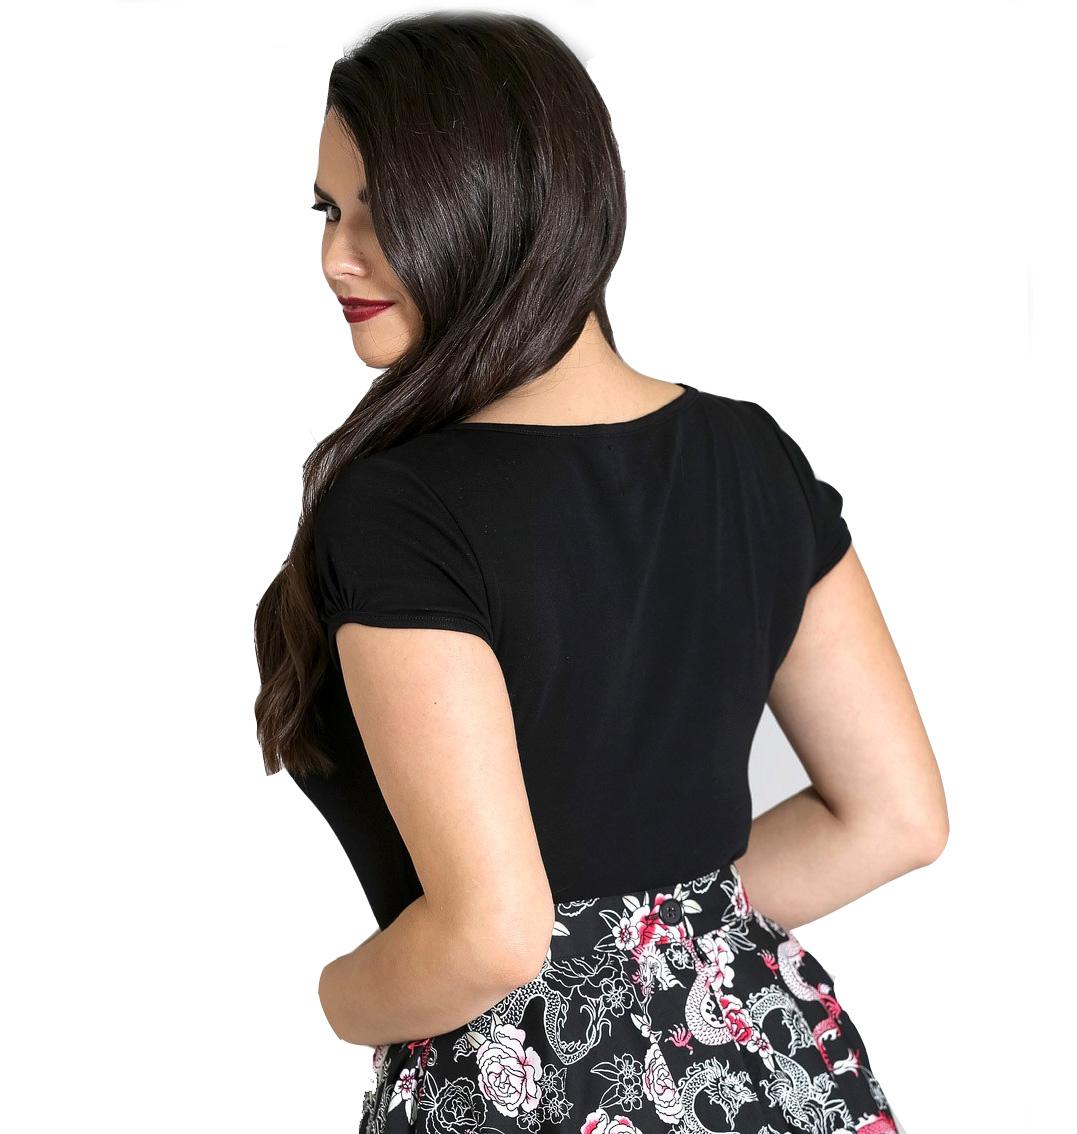 Hell-Bunny-Shirt-50s-Rockabilly-Top-MIA-Plain-Black-Short-Sleeves-All-Sizes thumbnail 5